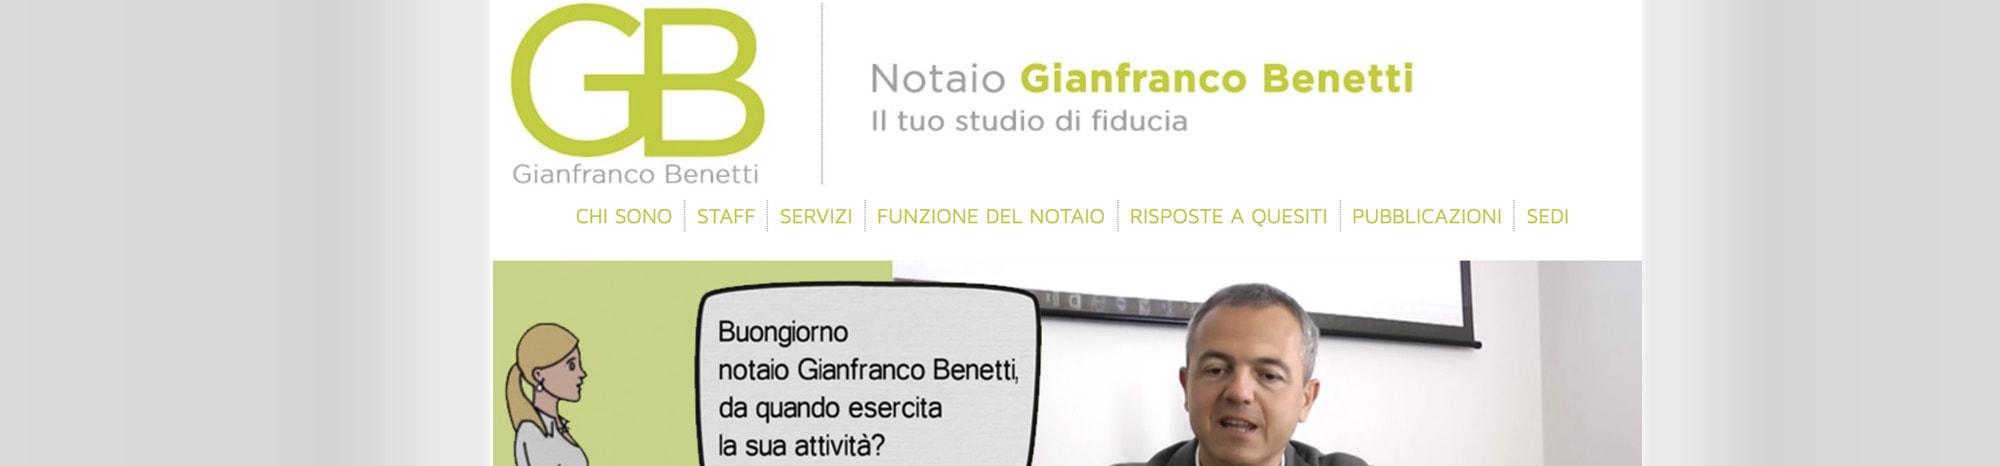 Notaio Benetti